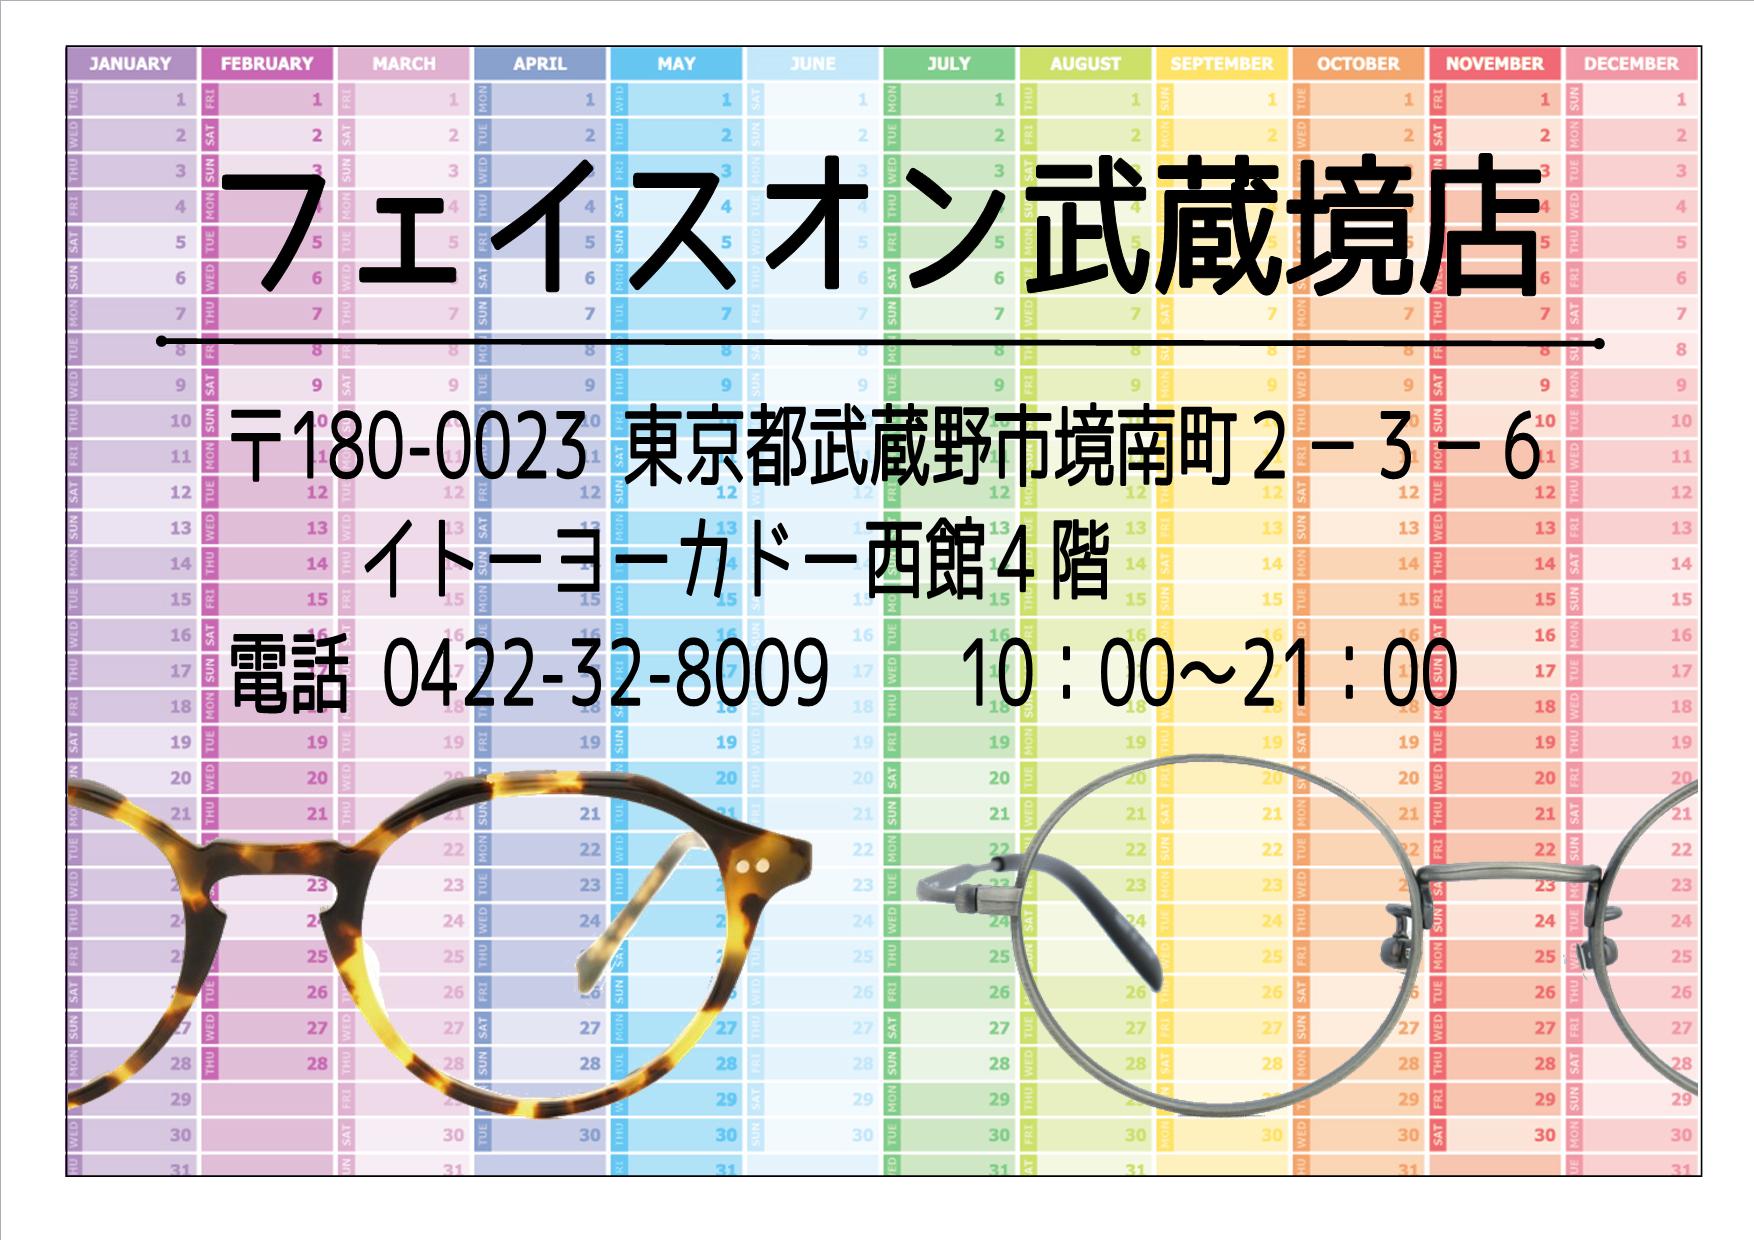 OAKLEY 武蔵野市 メガネ 口コミ 評判 スポーツメガネ